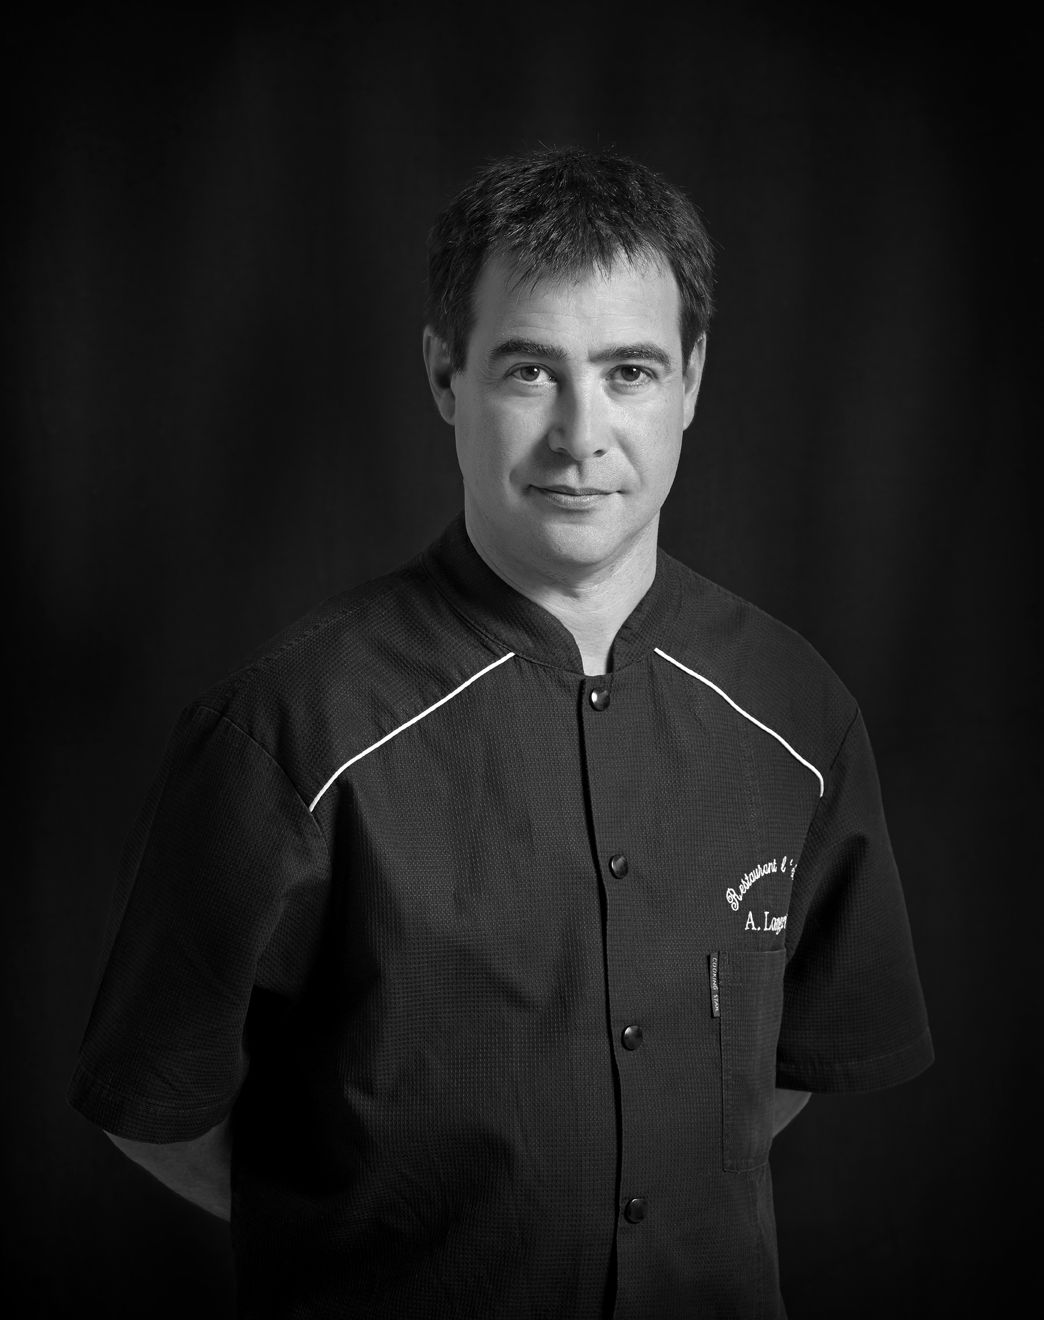 Alain Longeval